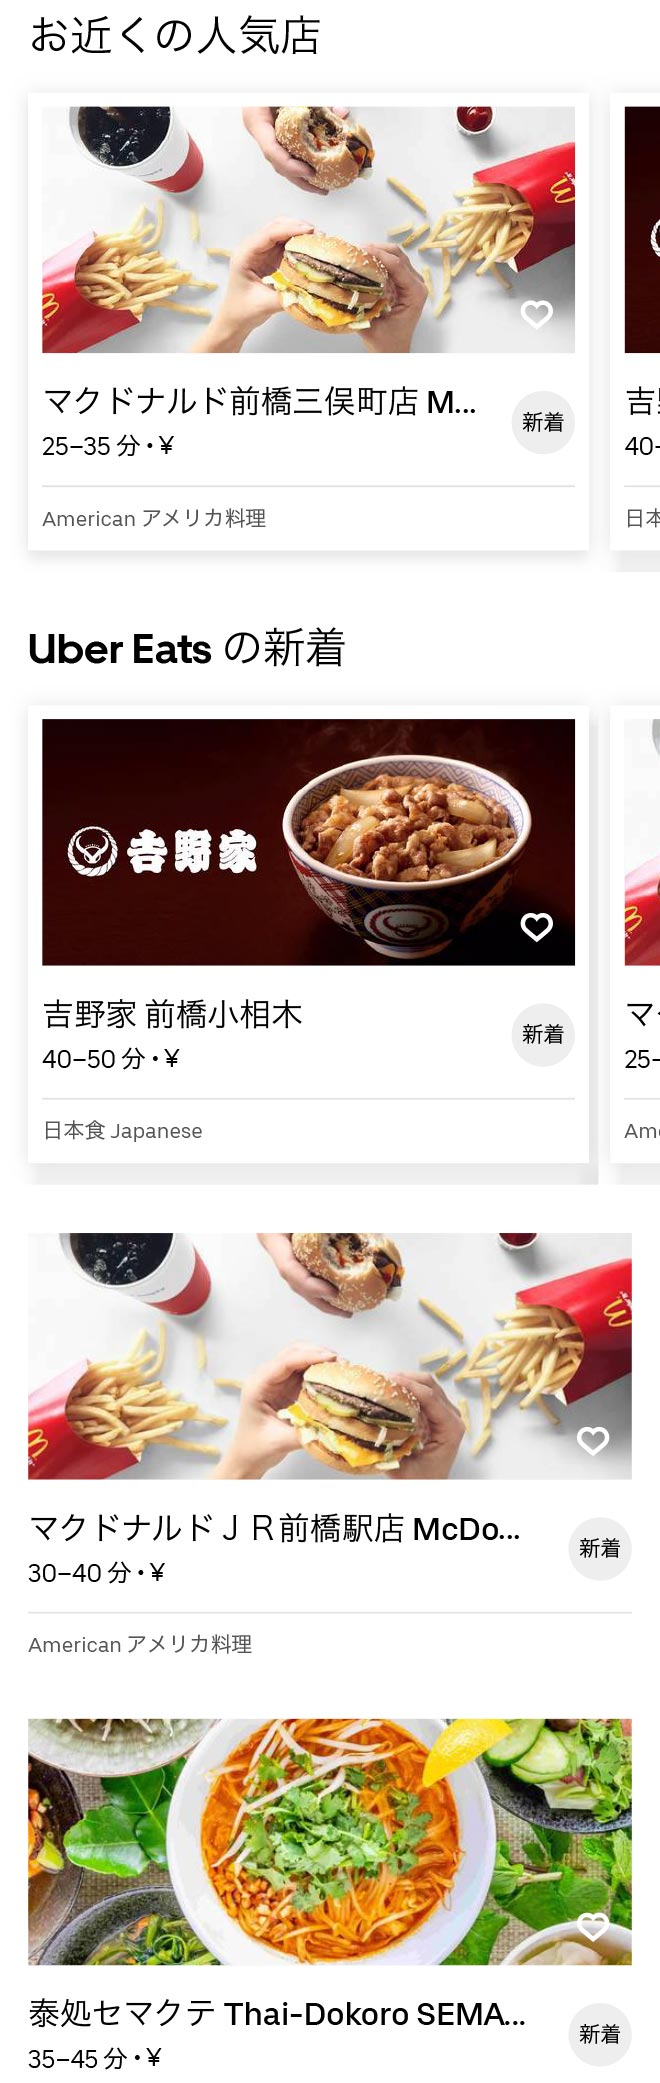 Chuou maebashi menu 2009 1